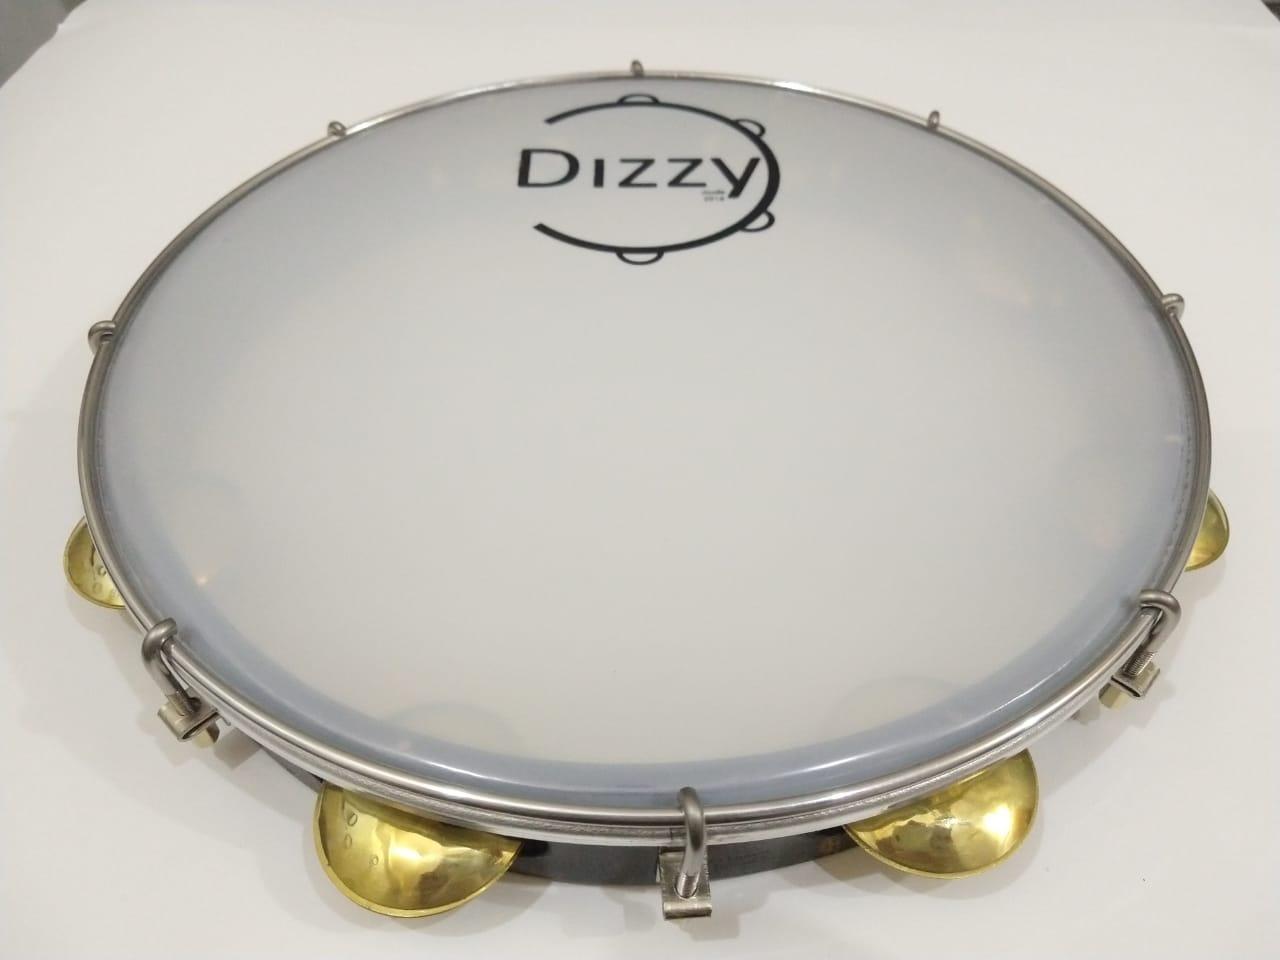 Pandeiro Dizzy 12 Pol Super Leve Marrom Escuro